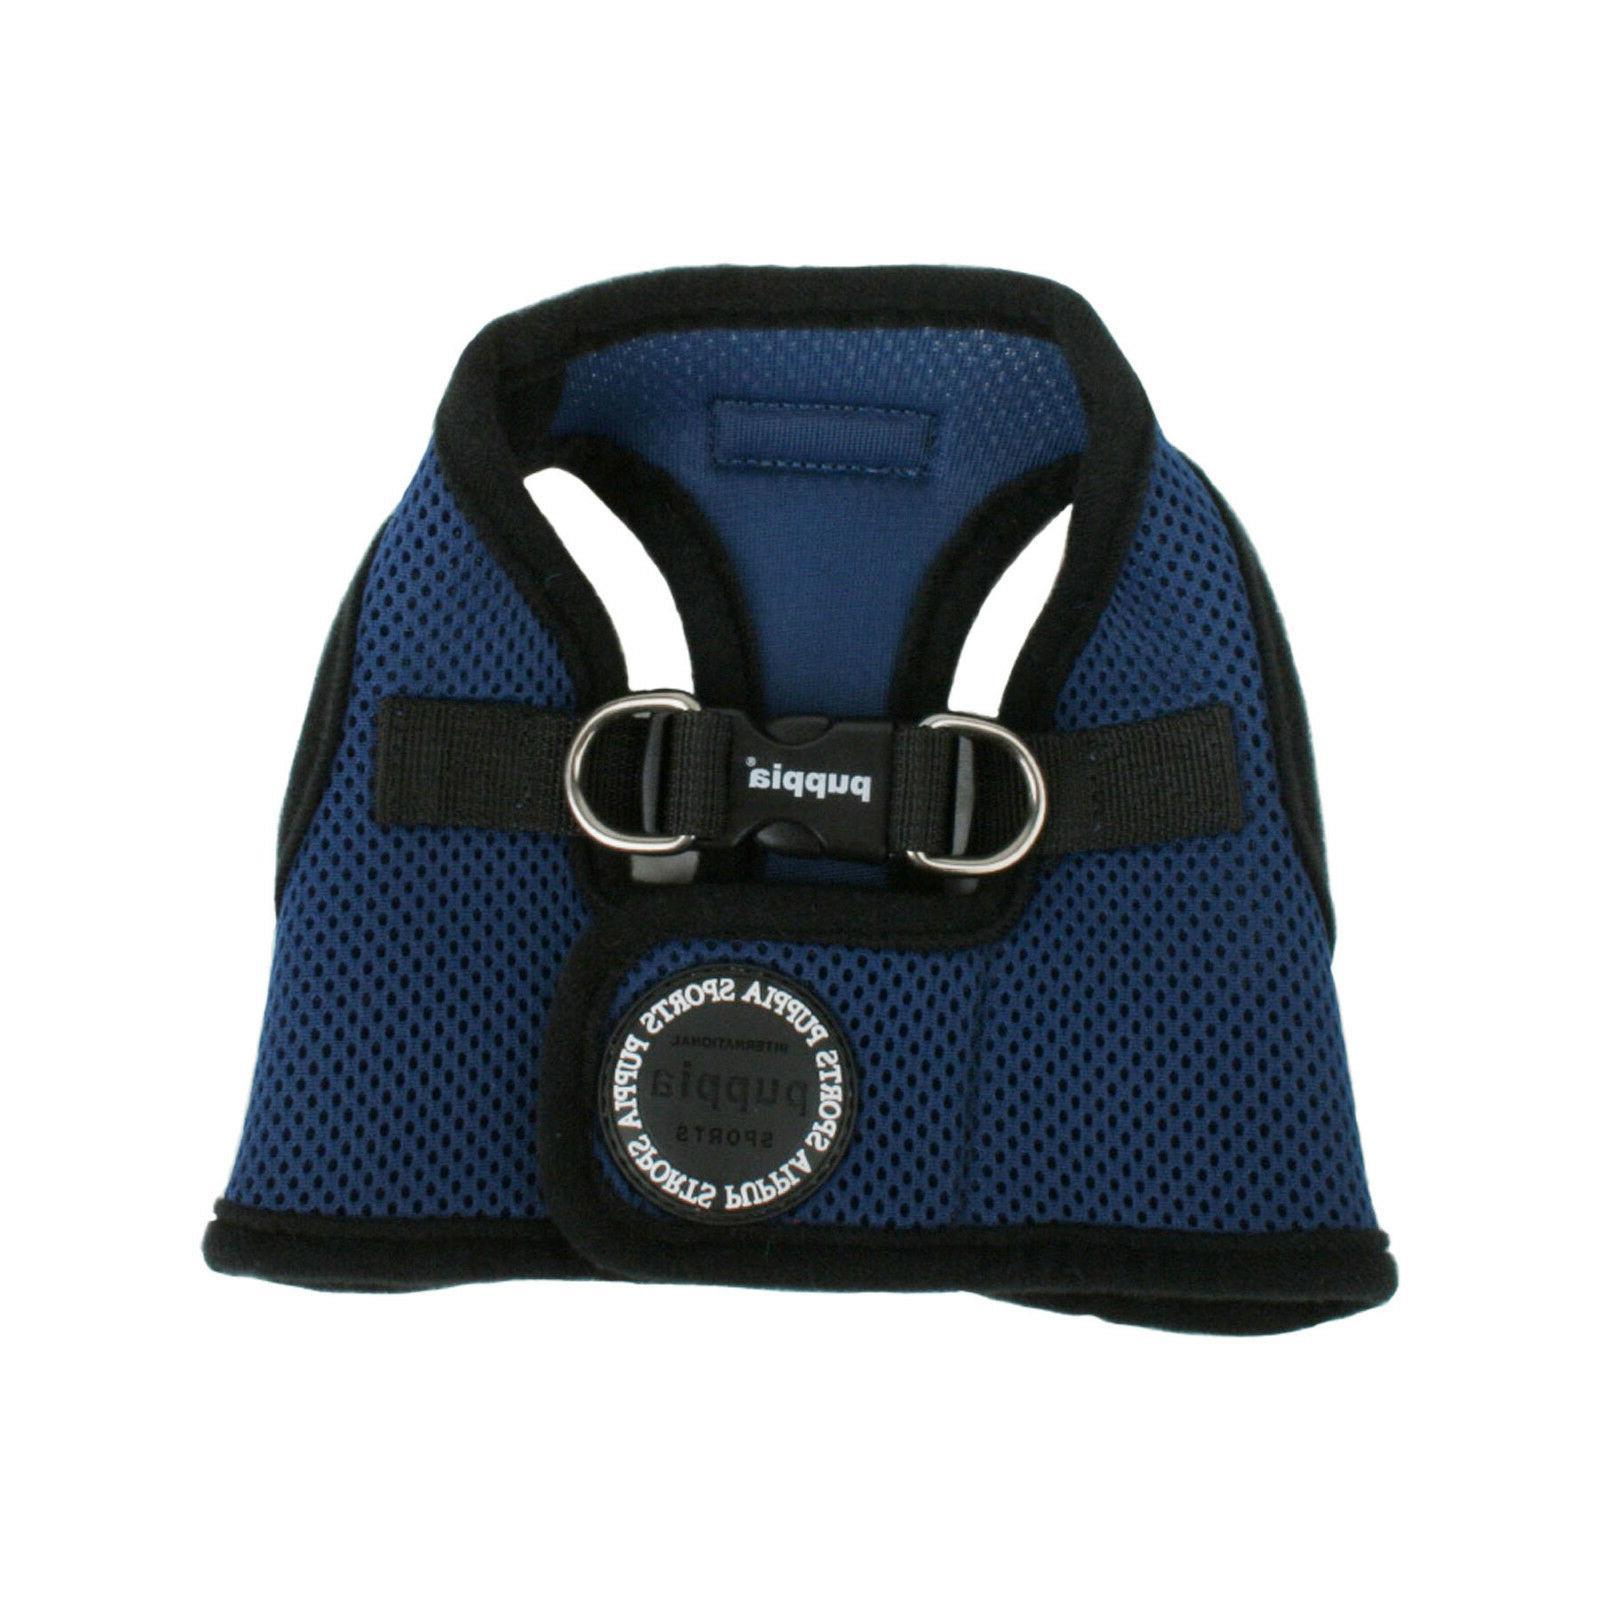 Puppia® Adjust. Breathable Dog Harness - M, XL, XXL, 3L - AH305